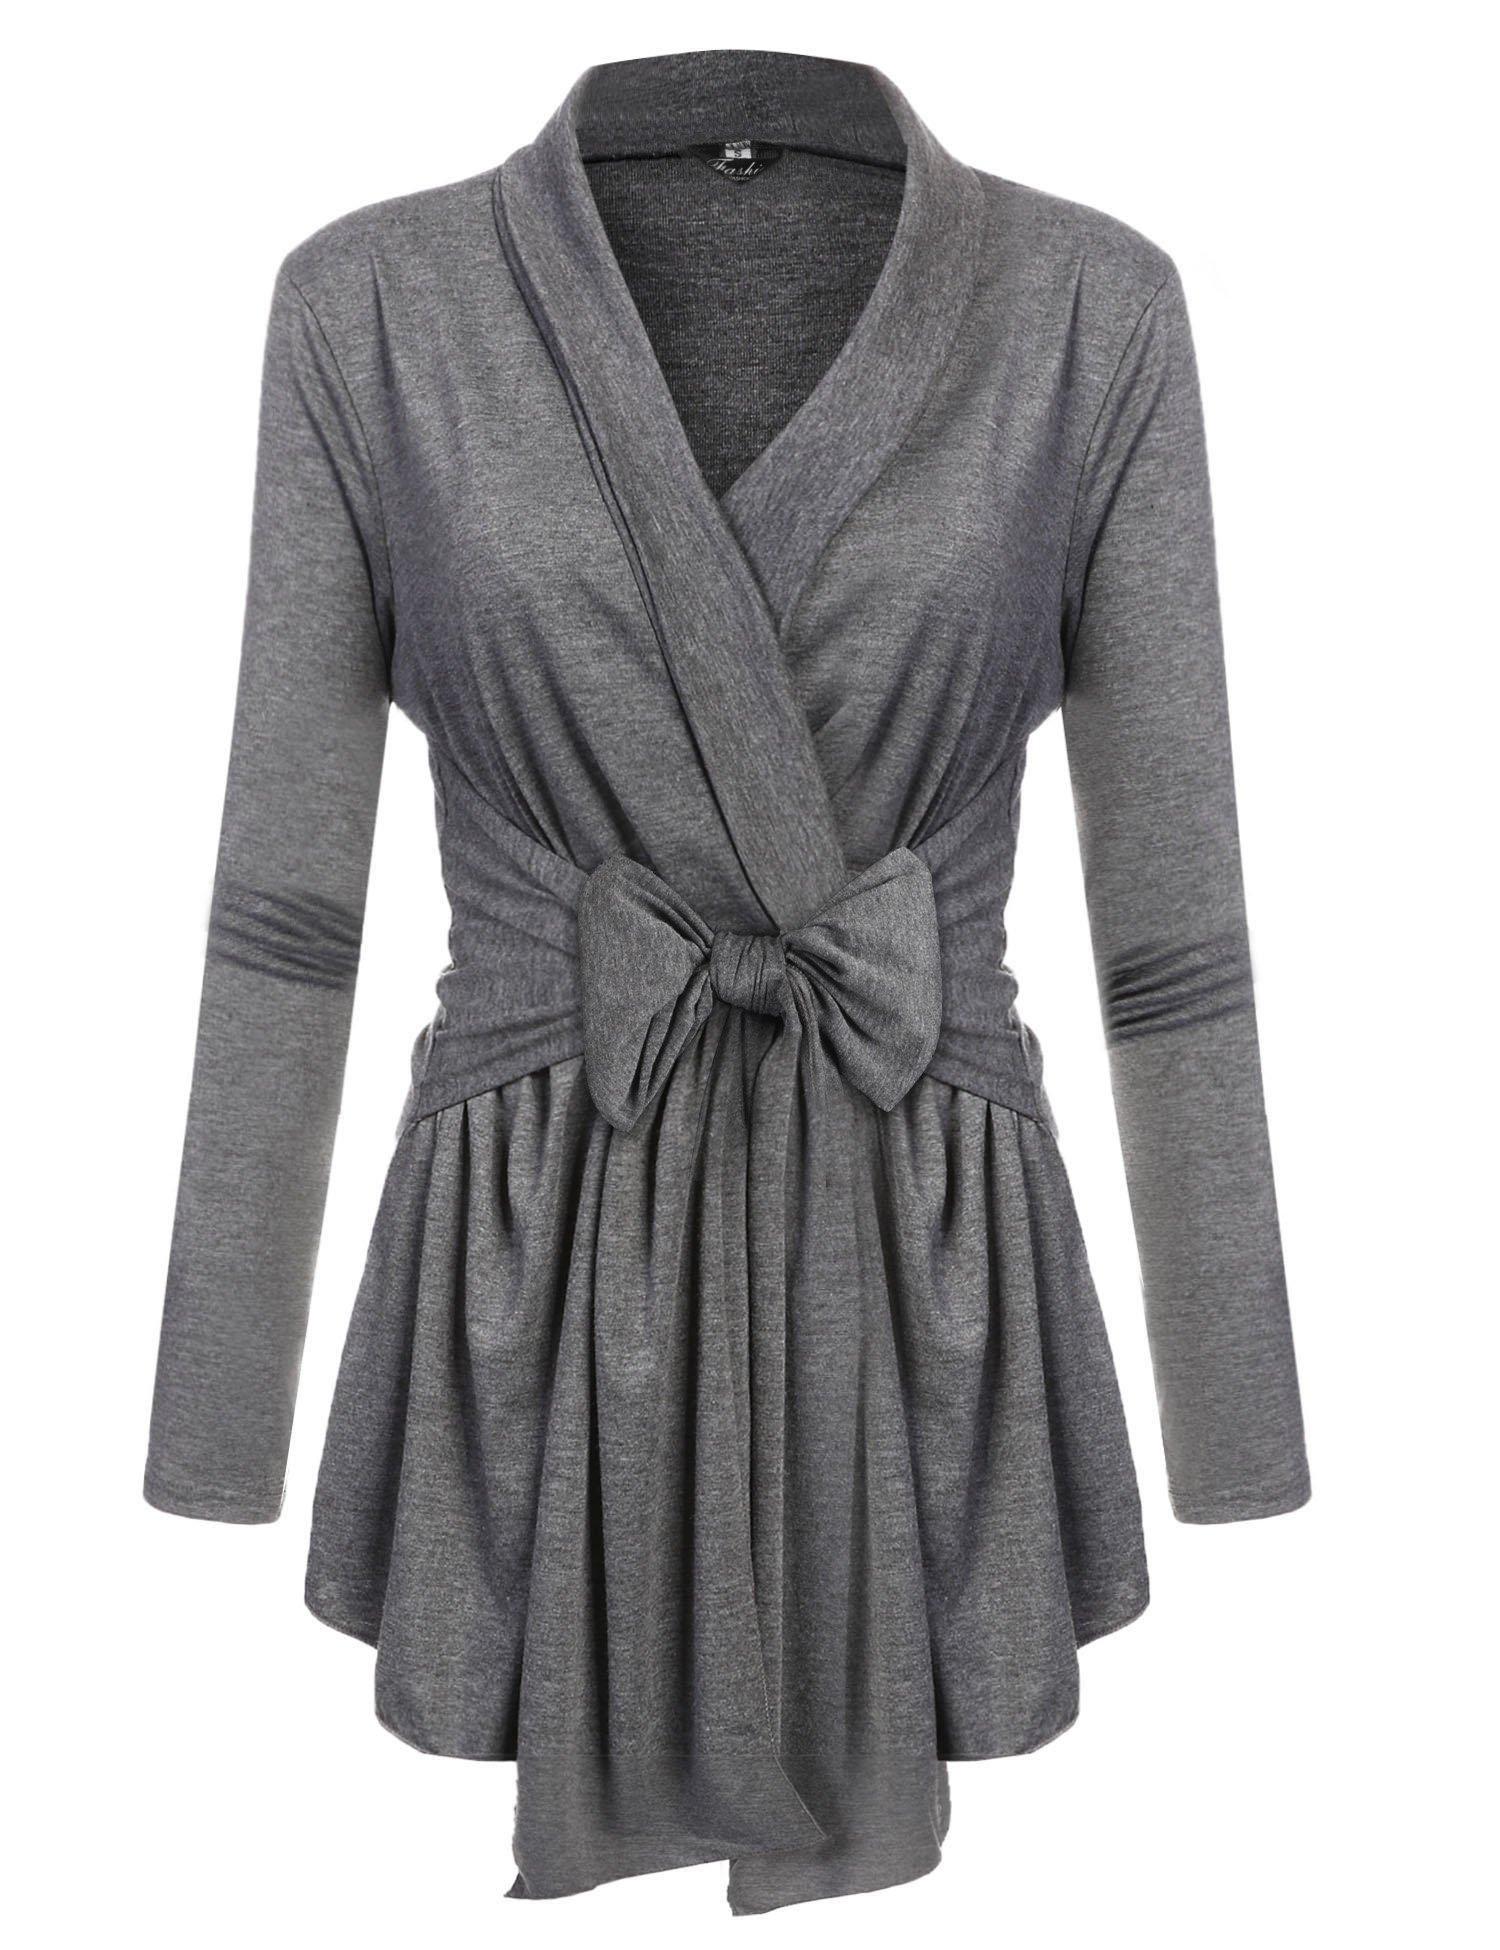 Henwei Womens Open Front Classic Knit Travel Sweater Cardigan Dark Grey S